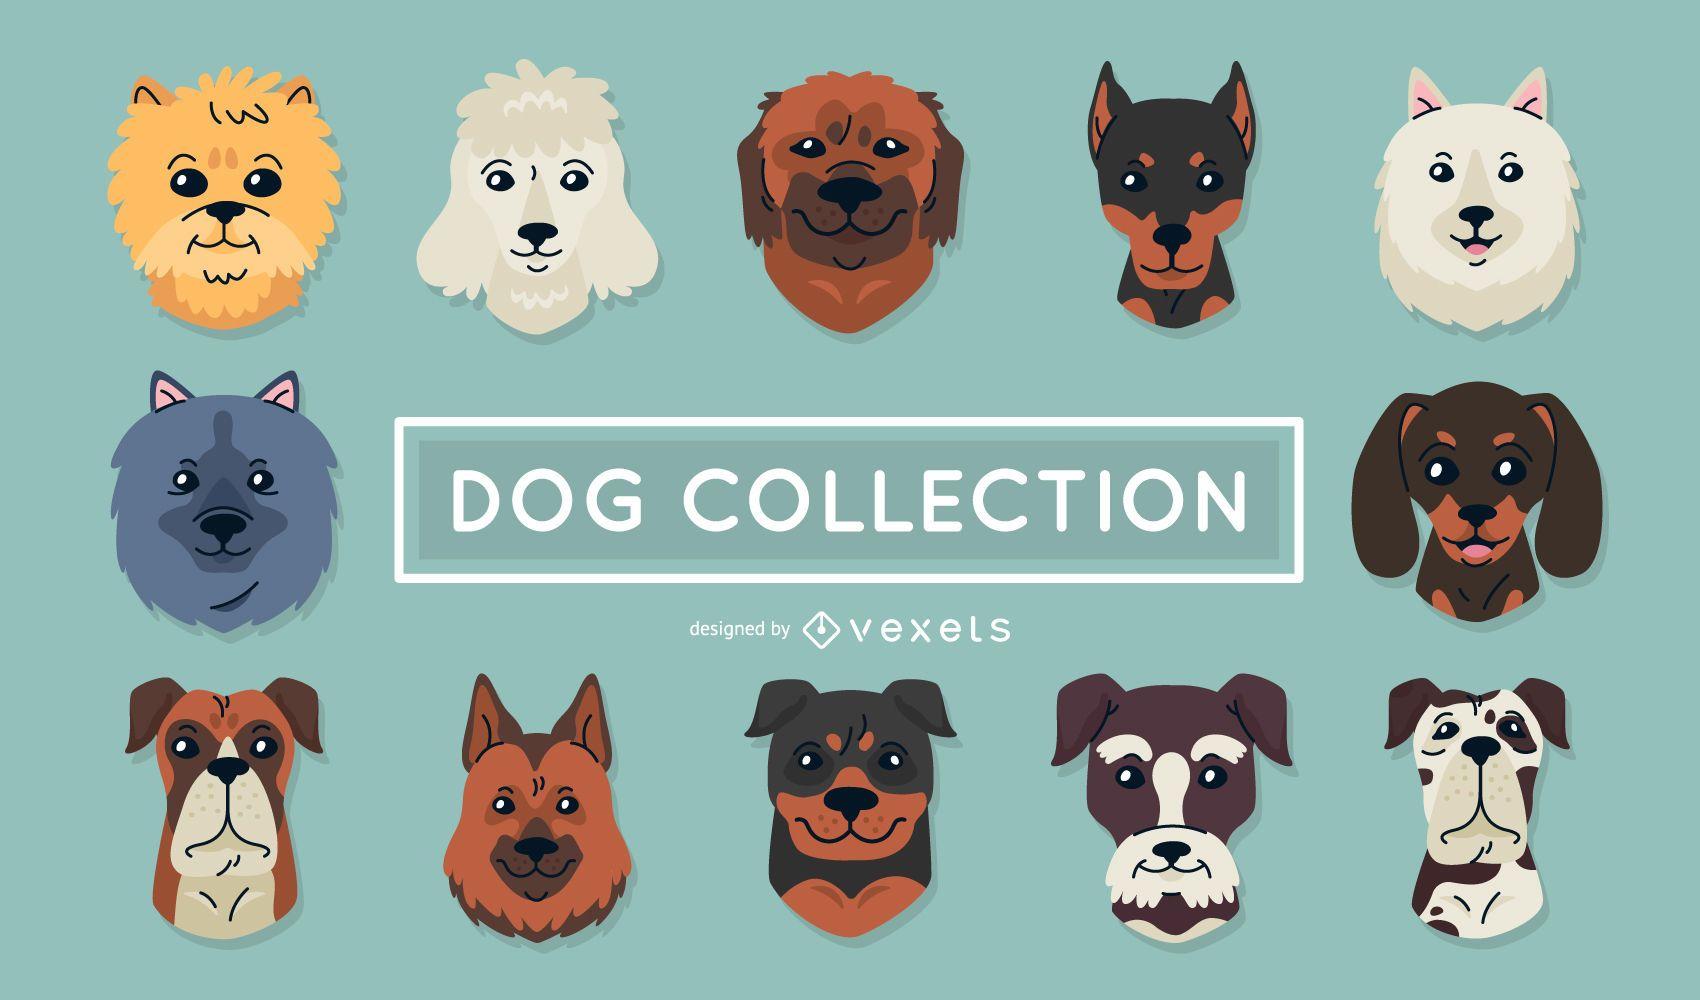 Dog illustration collection